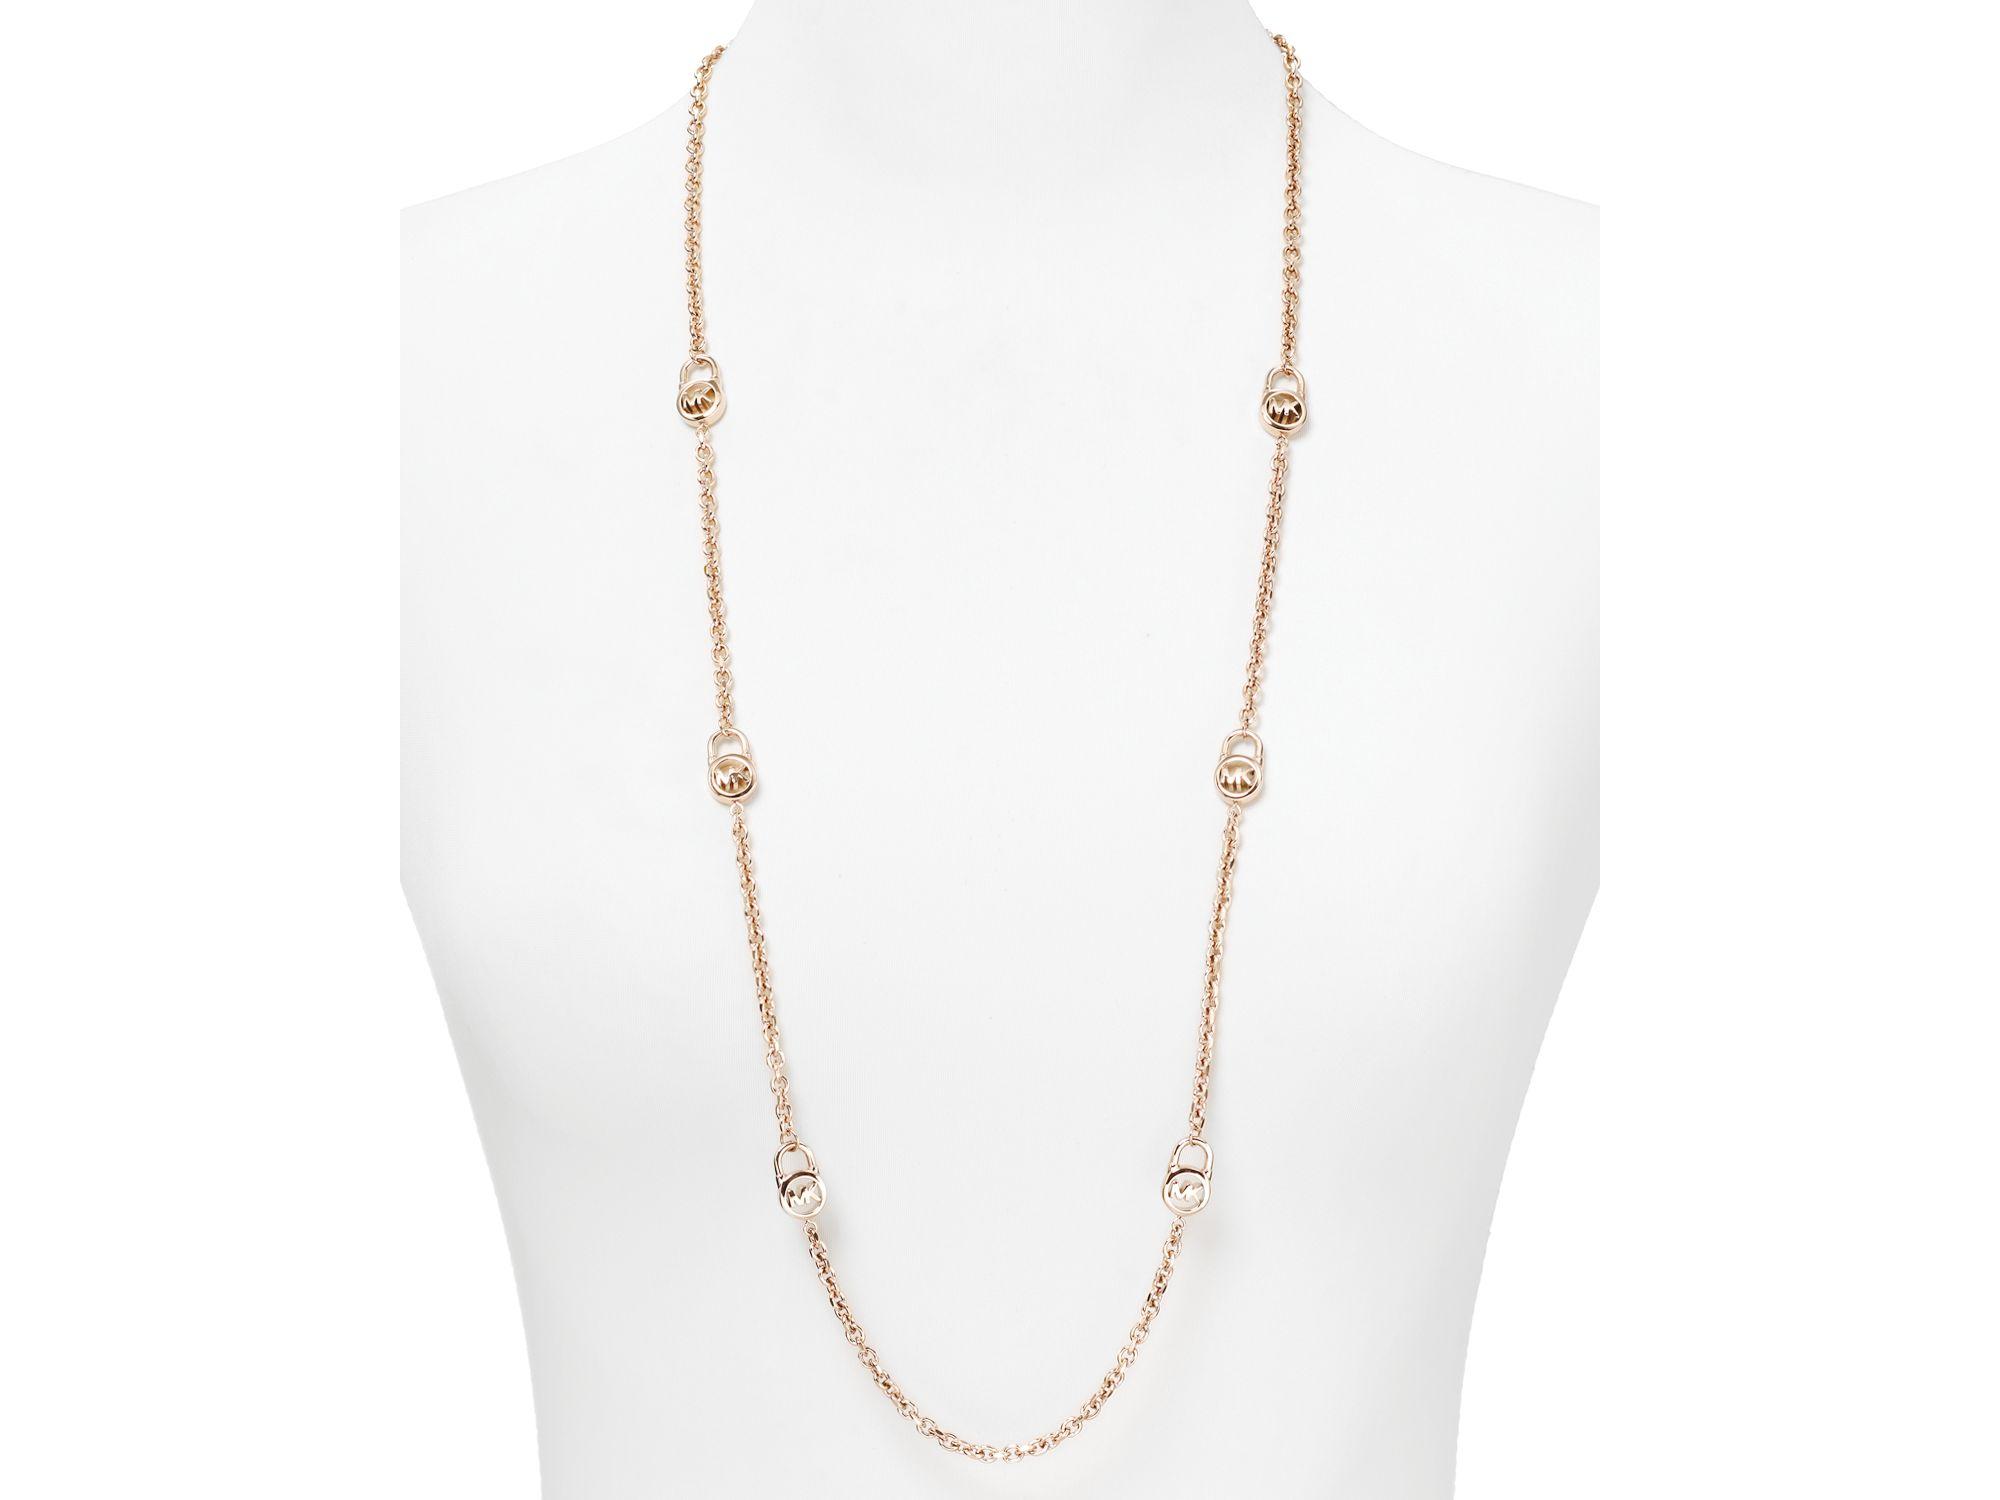 Lyst Michael Kors Multi Logo Padlock Necklace In Metallic